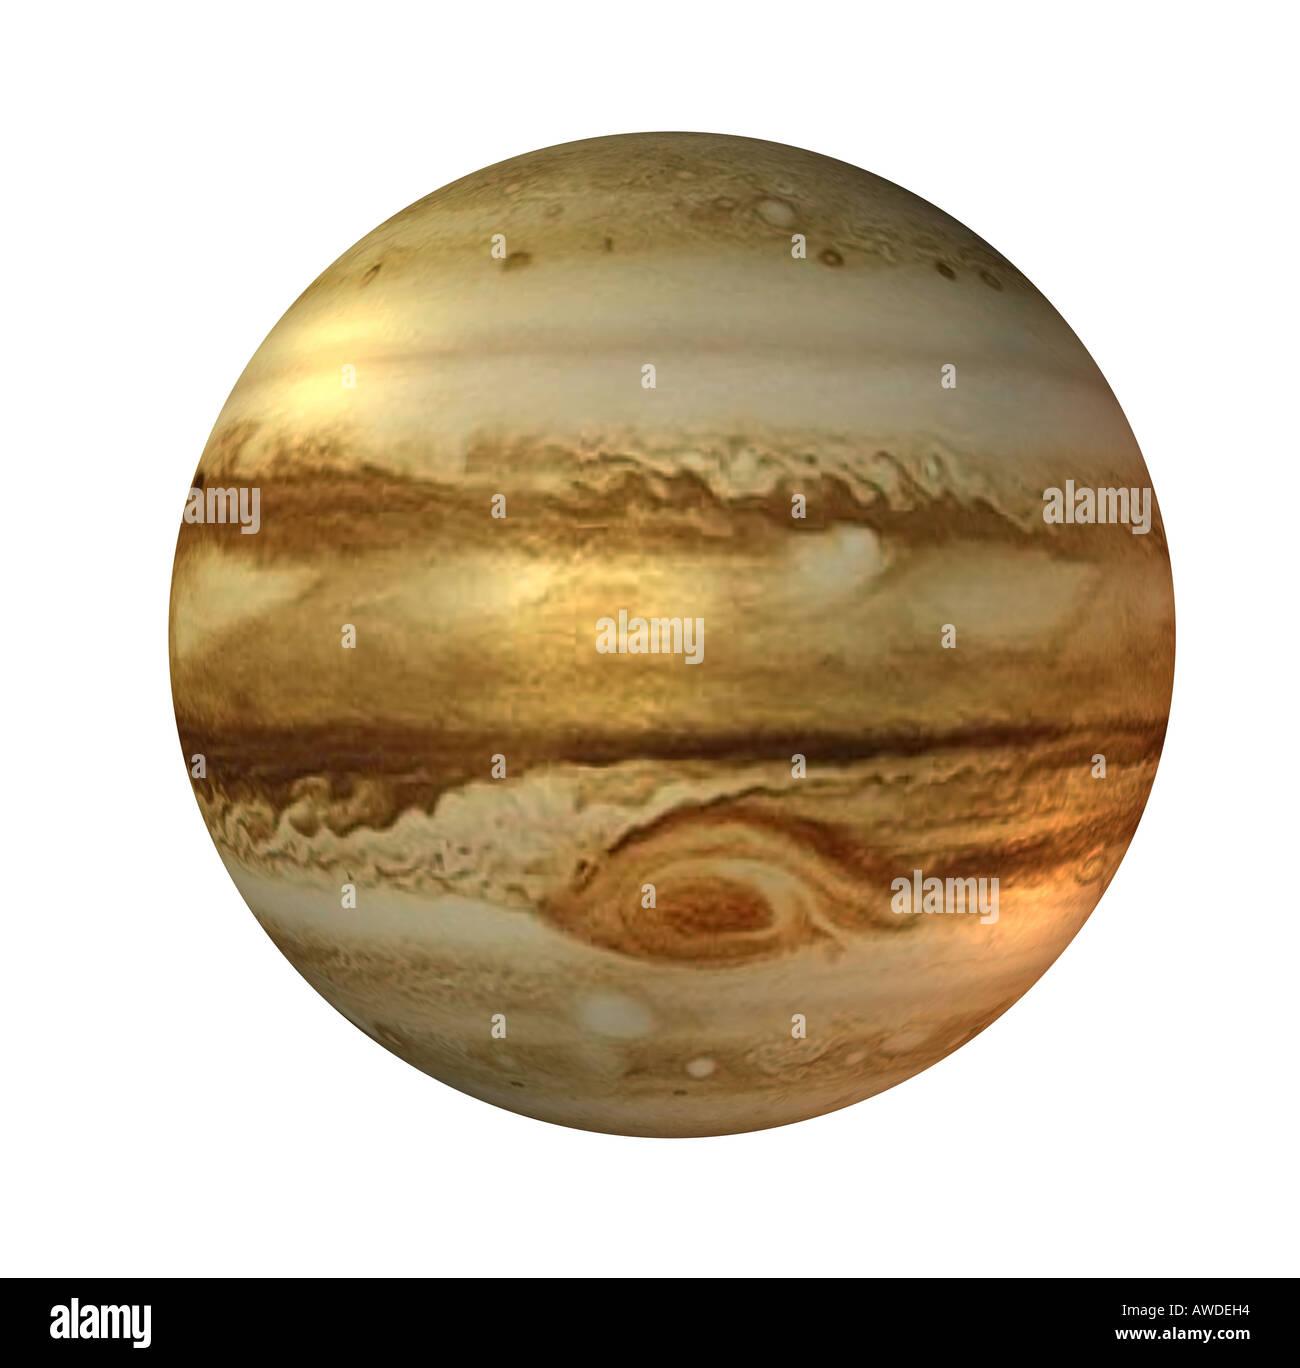 jupiter fifth planet - photo #18